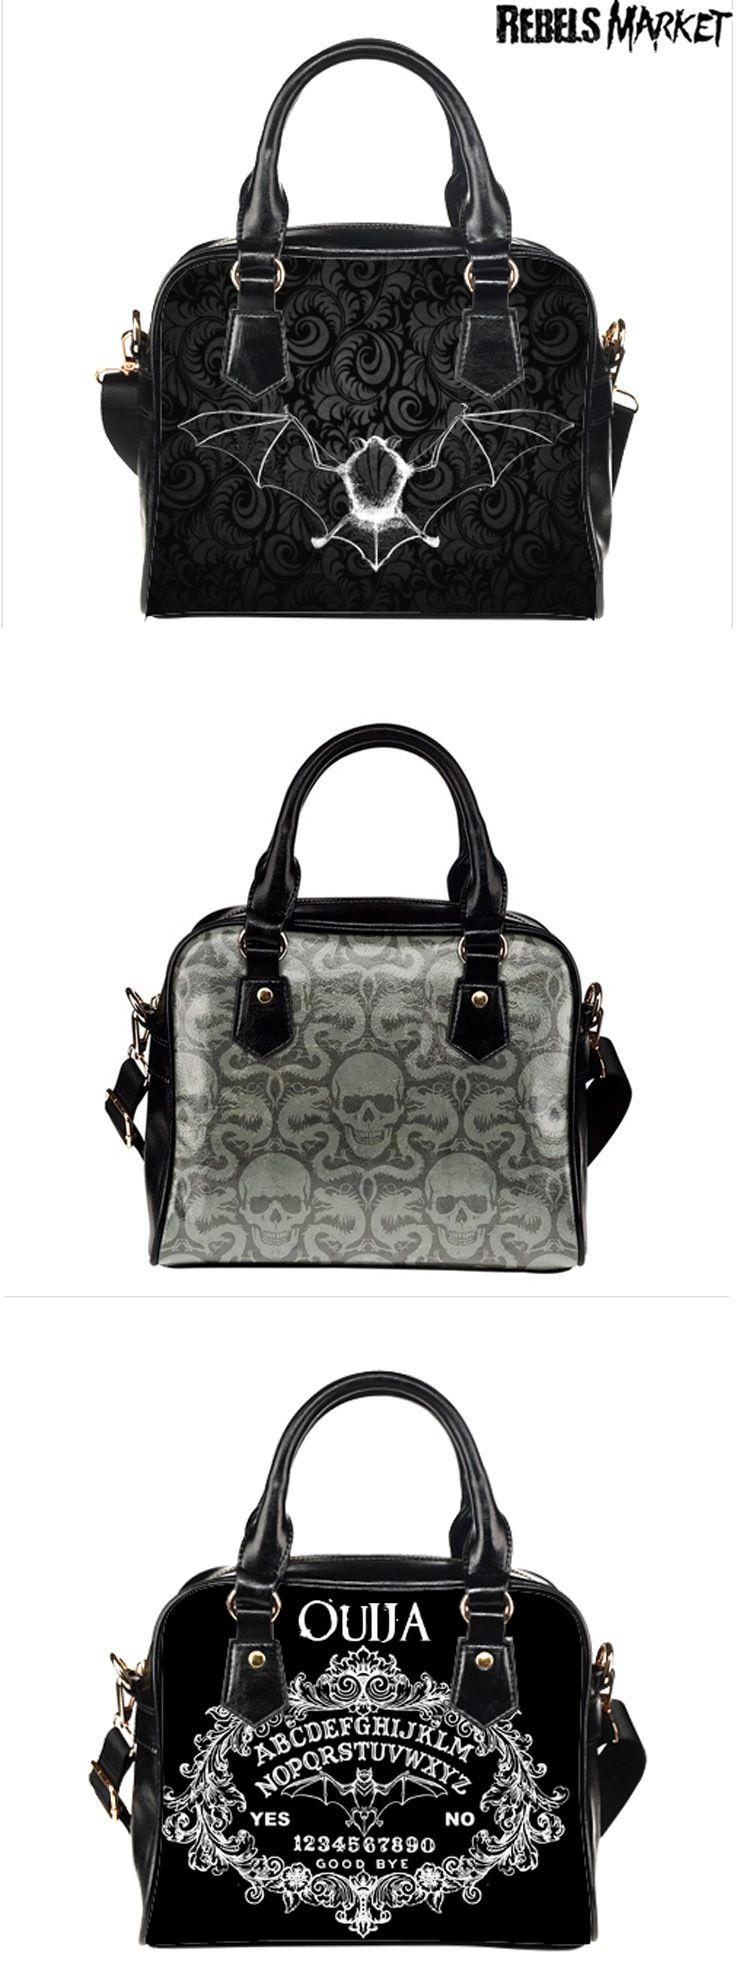 Shop goth handbags at RebelsMarket.